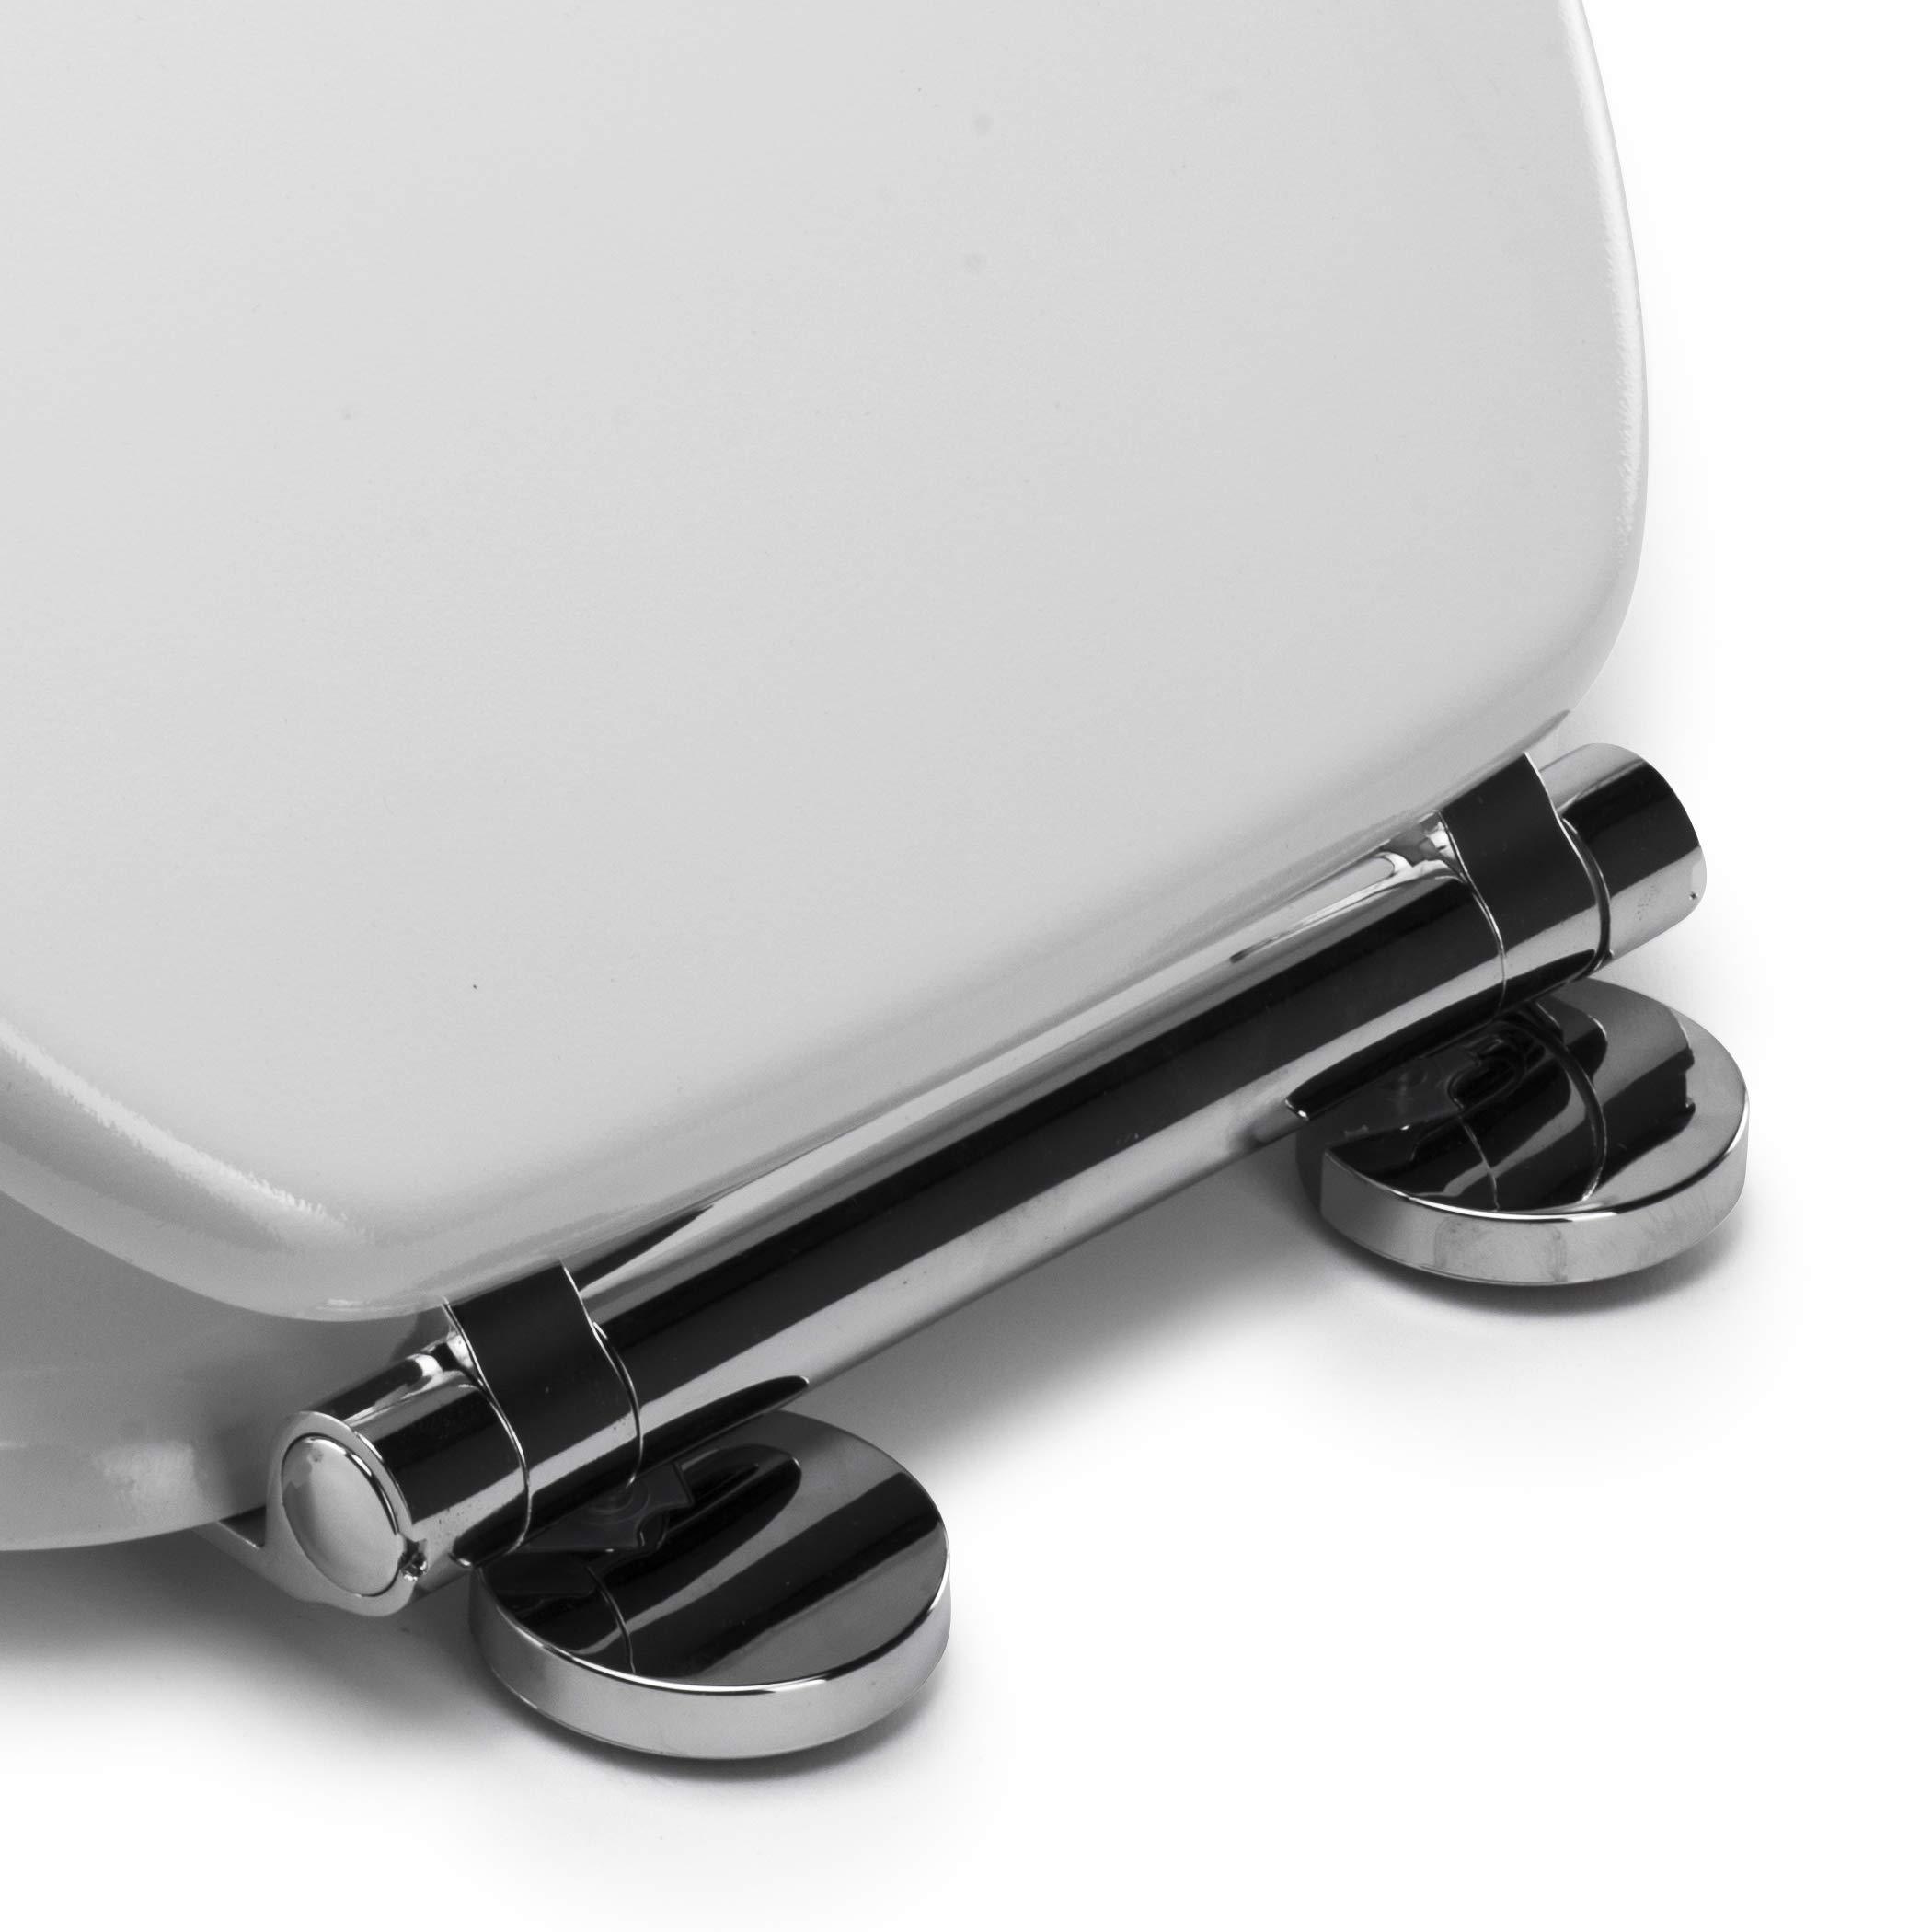 White Wood Croydex Flexi-Fix Lugano Always Fits Never Slips Slow Close Anti Bacterial Toilet Seat 43 x 36.8 x 6 cm